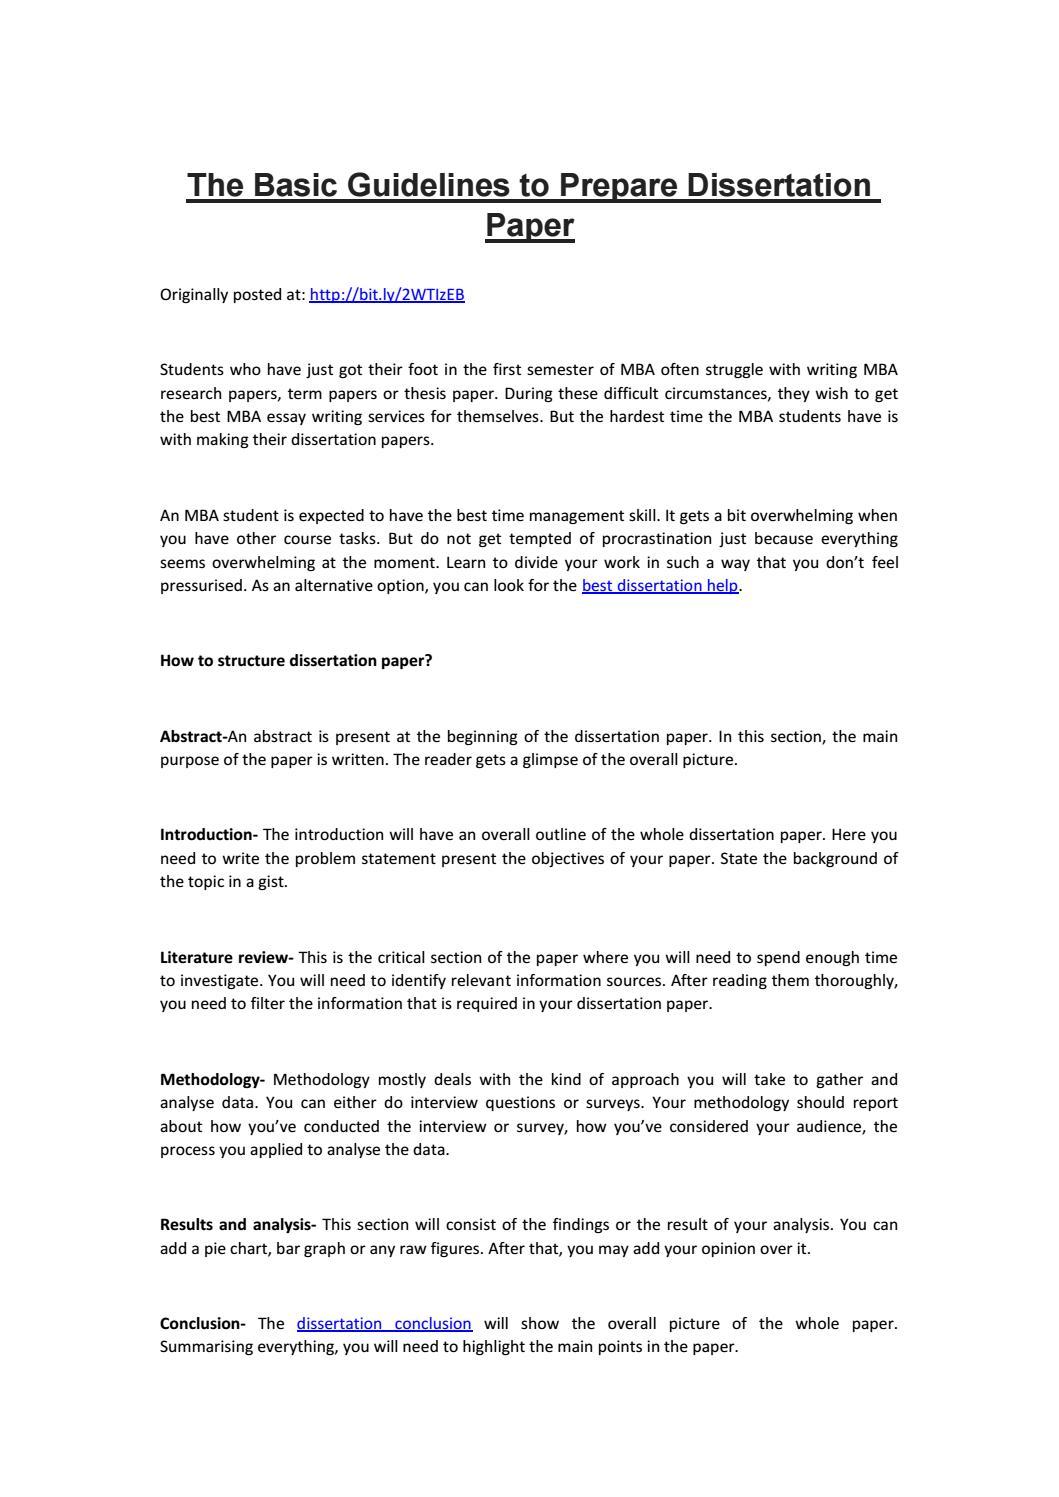 Dissertation paper uk dissertation help